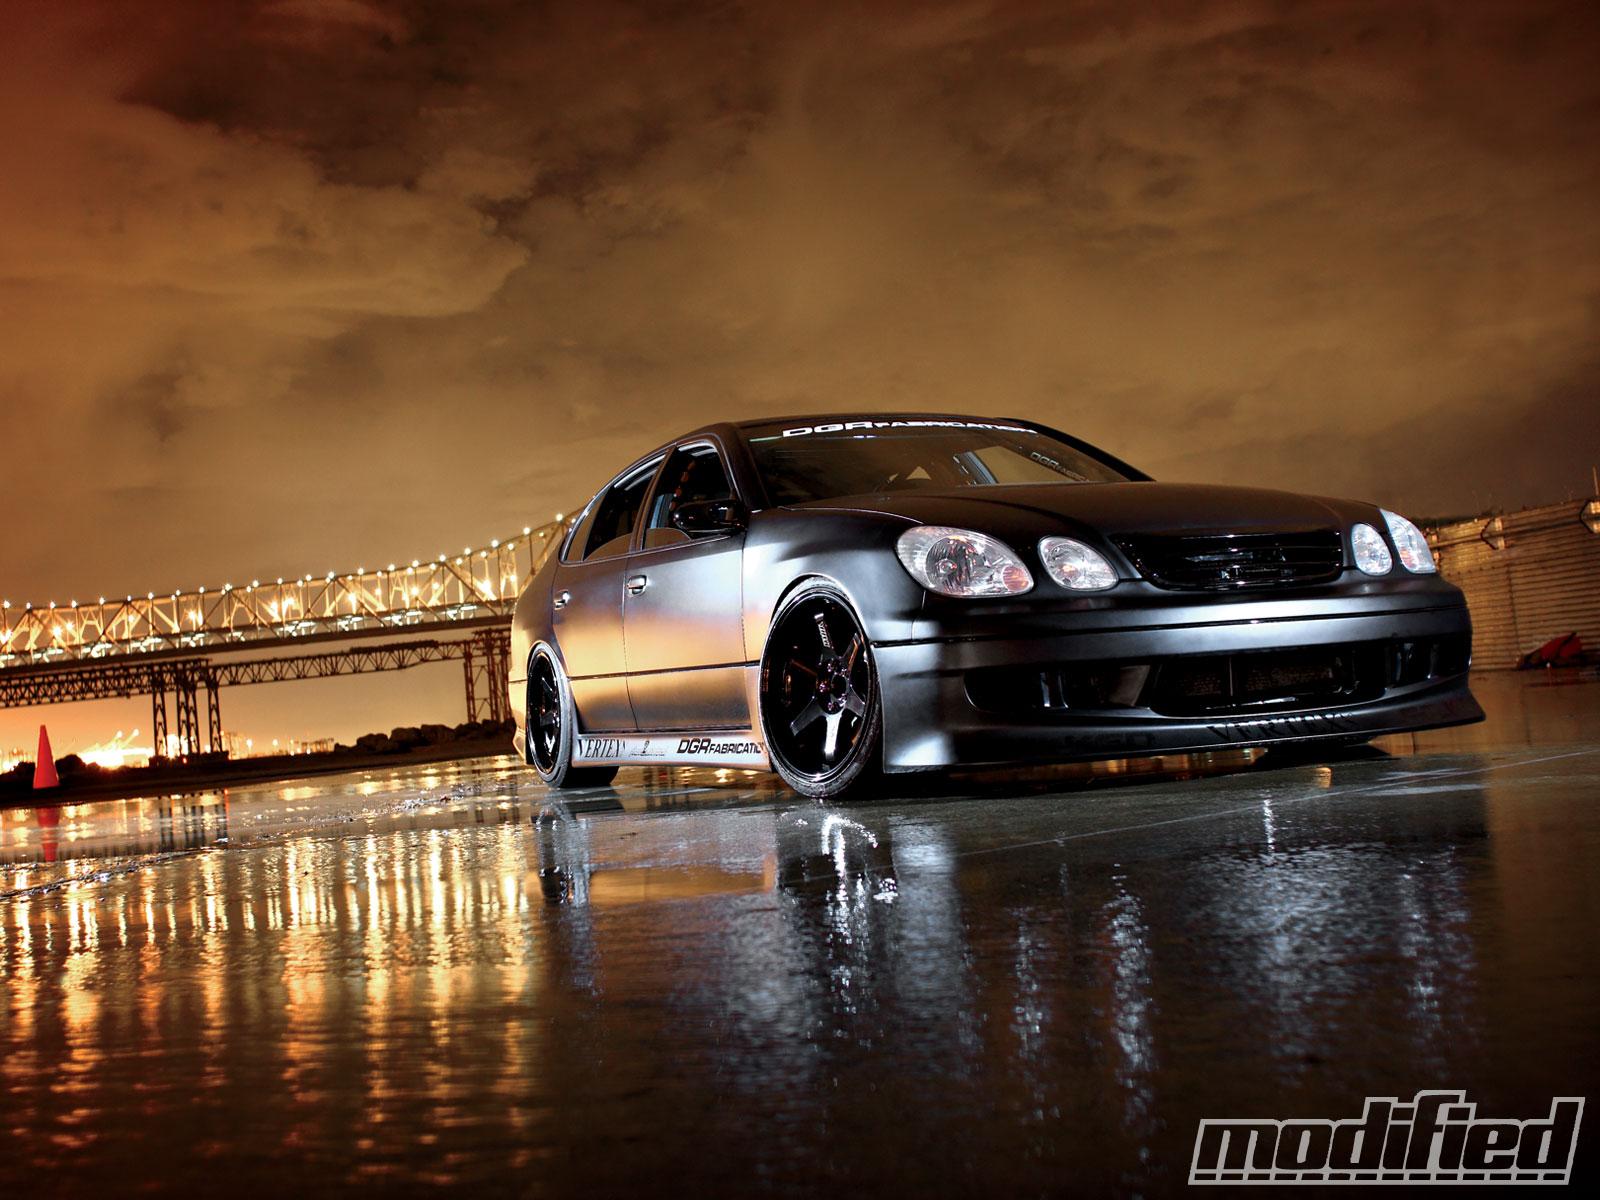 2000 Lexus GS300 - Modified Magazine